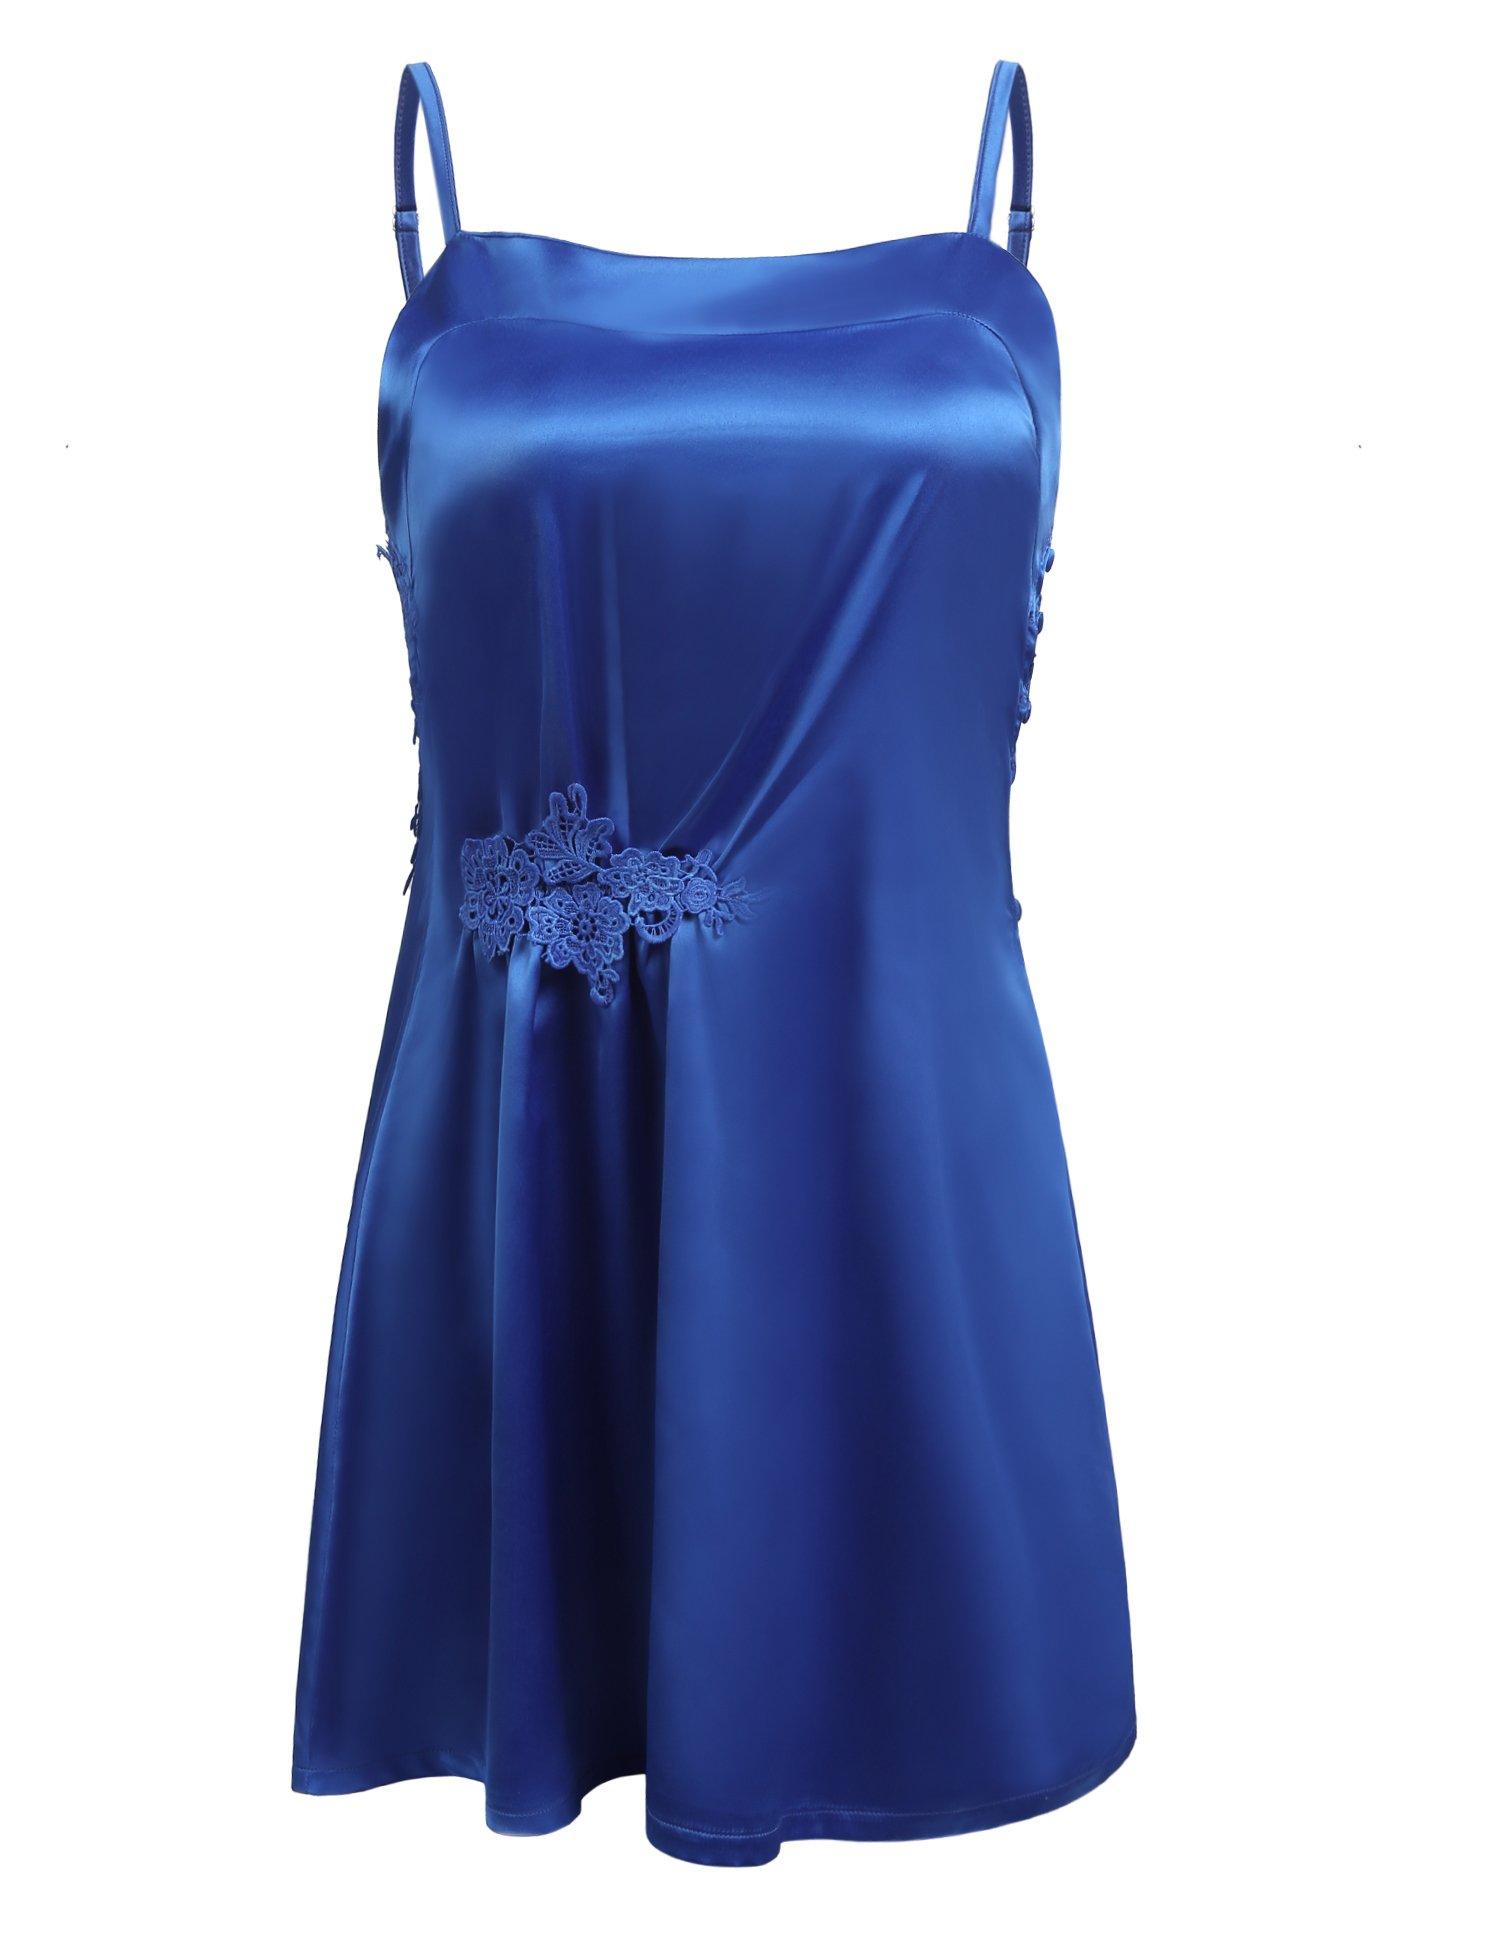 luxilooks Sleepwear Women Satin Nightdress Racerback Sleeveless Chemise Nightgown Sexy Slip Dress S-XXL